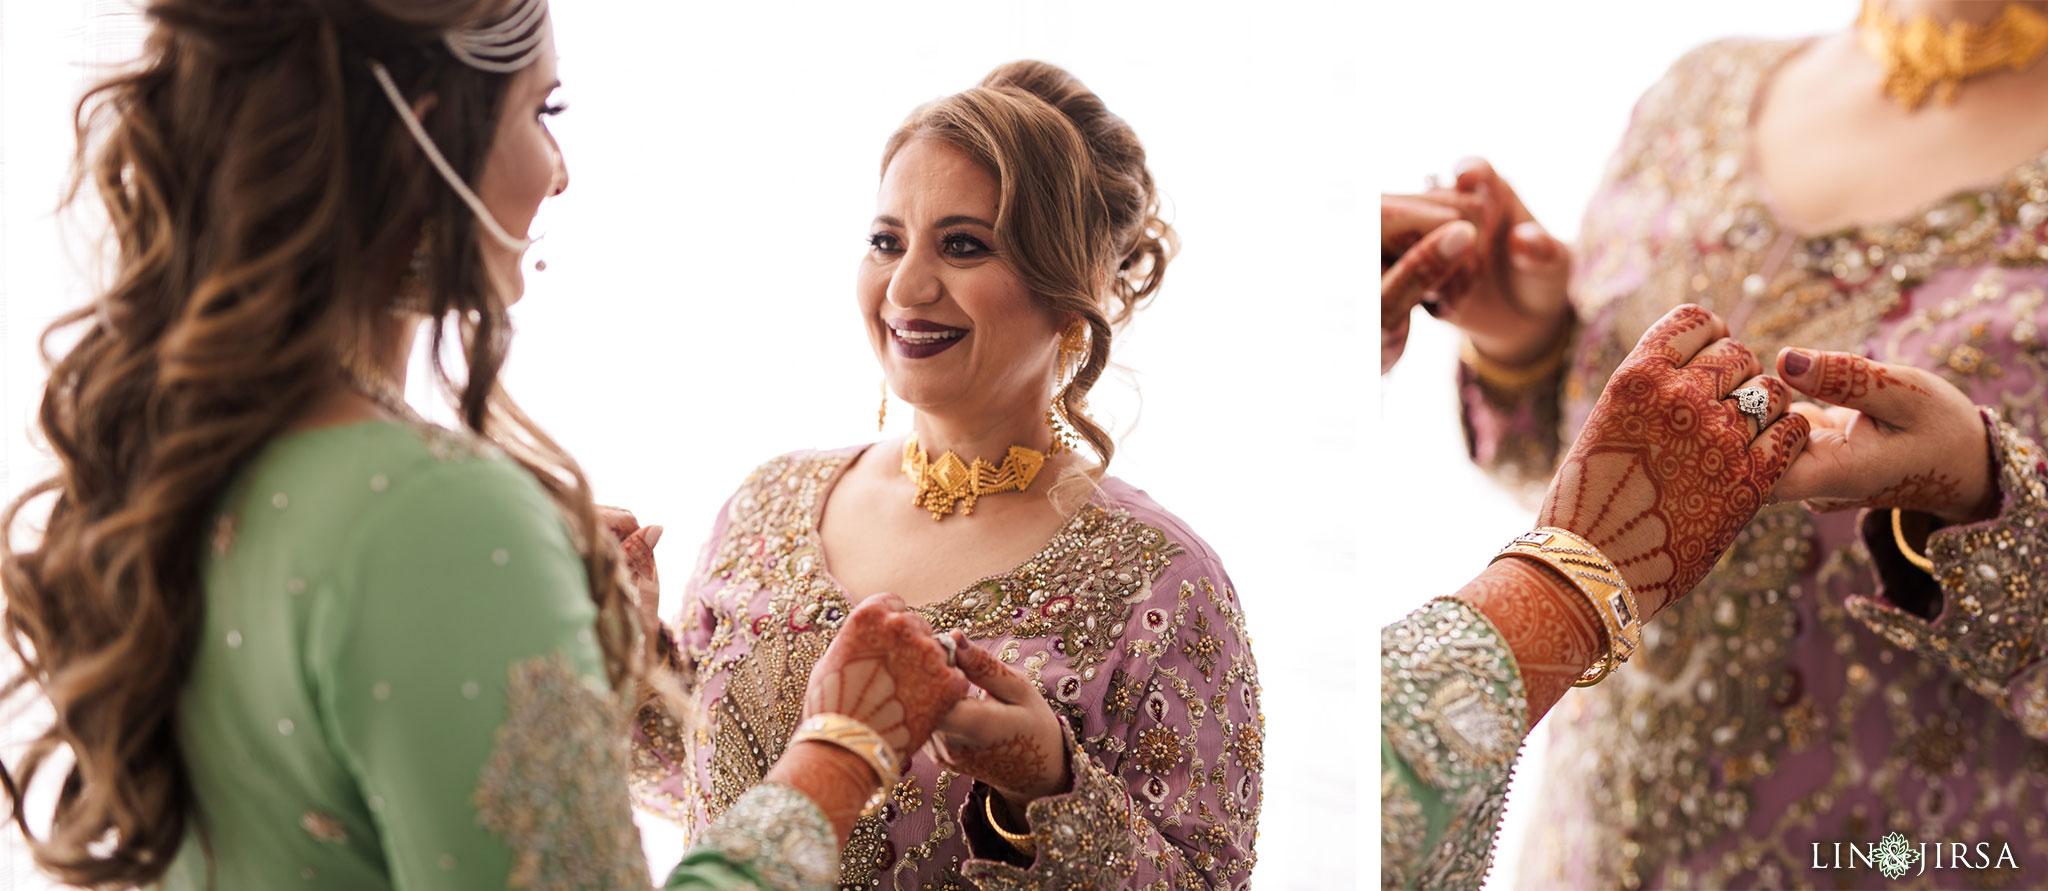 004 pasea hotel huntington beach pakistani muslim wedding photography